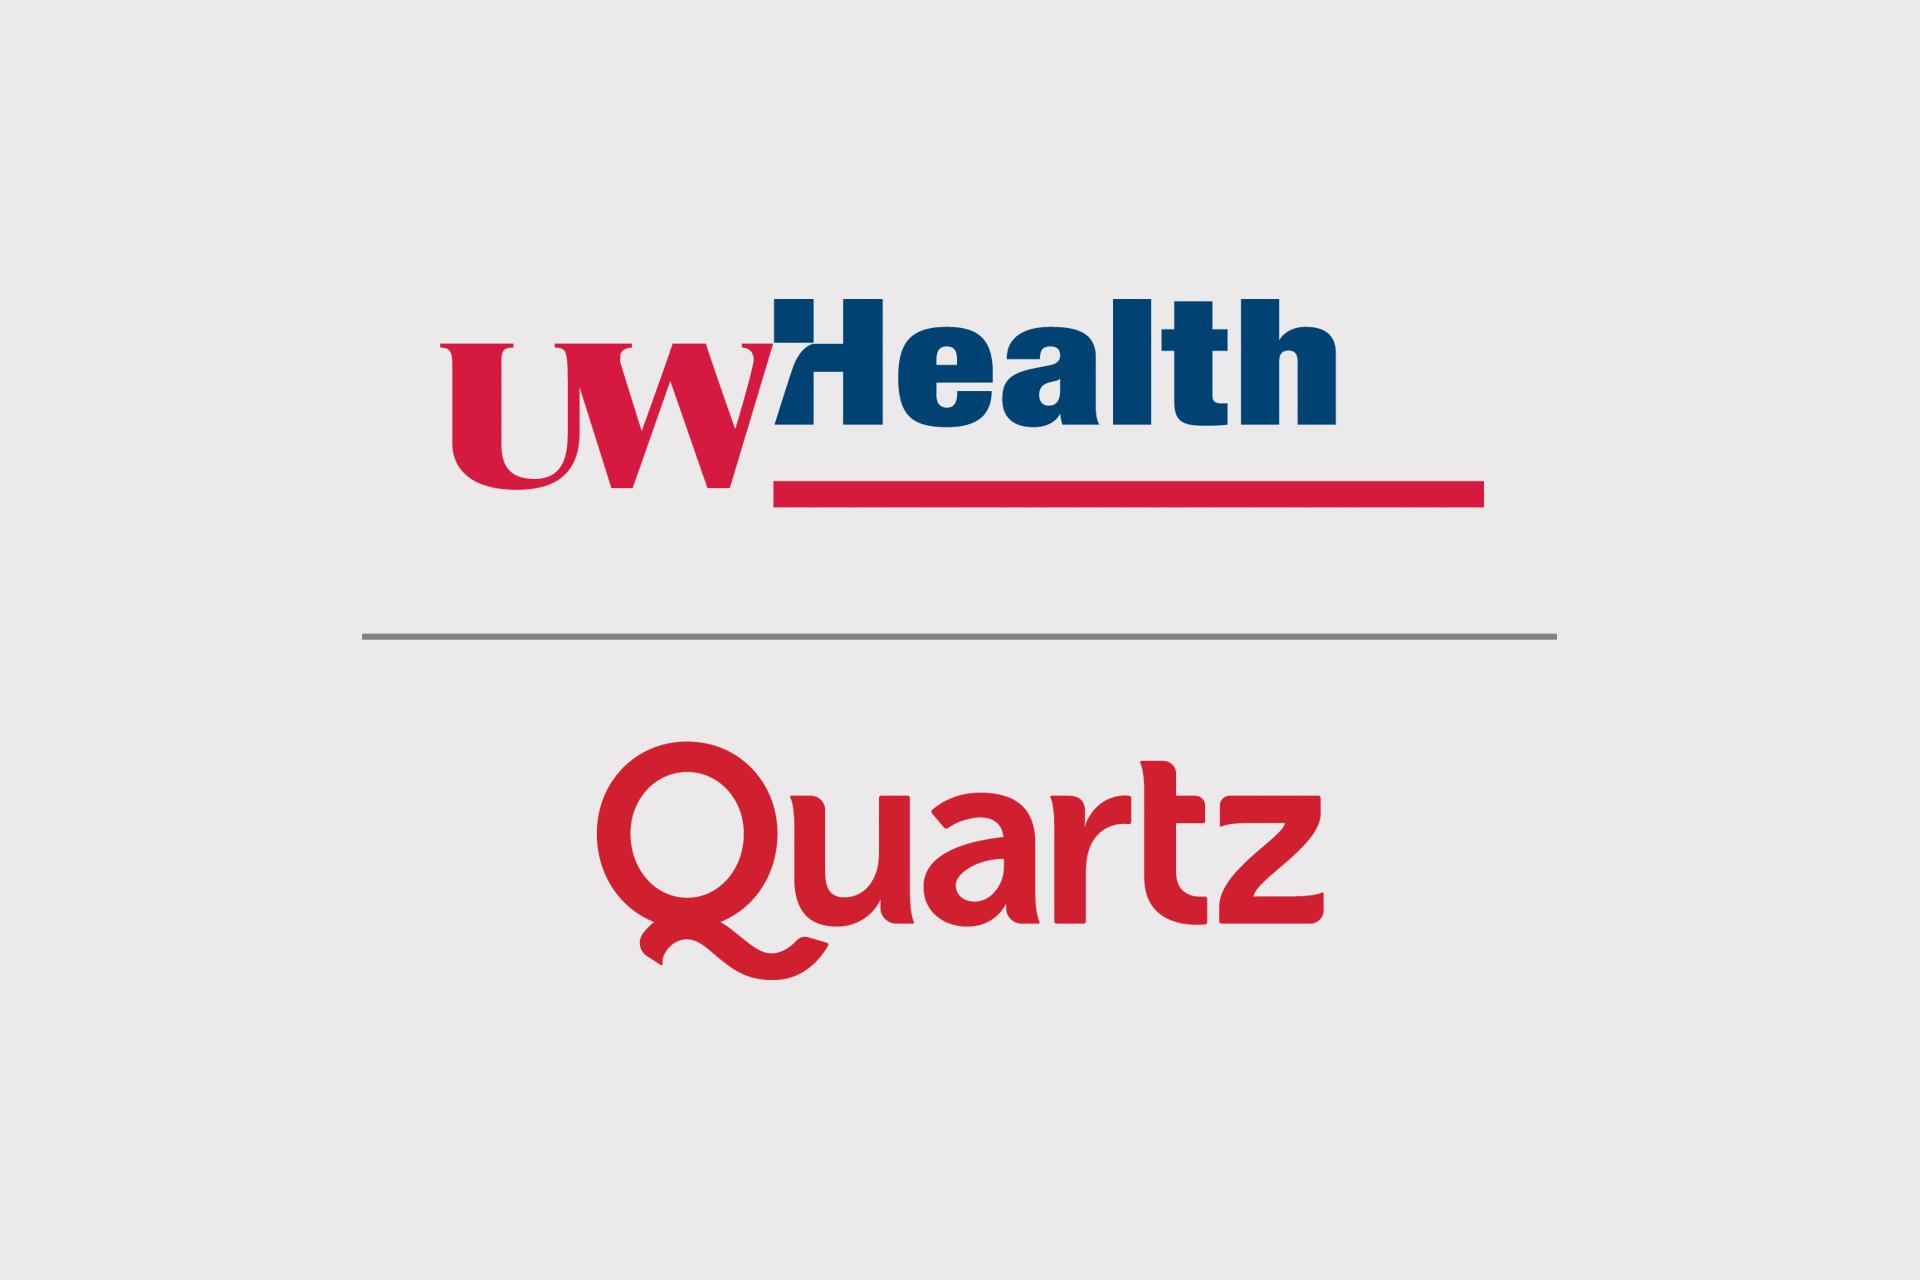 UW Health - Quartz Health Solutions